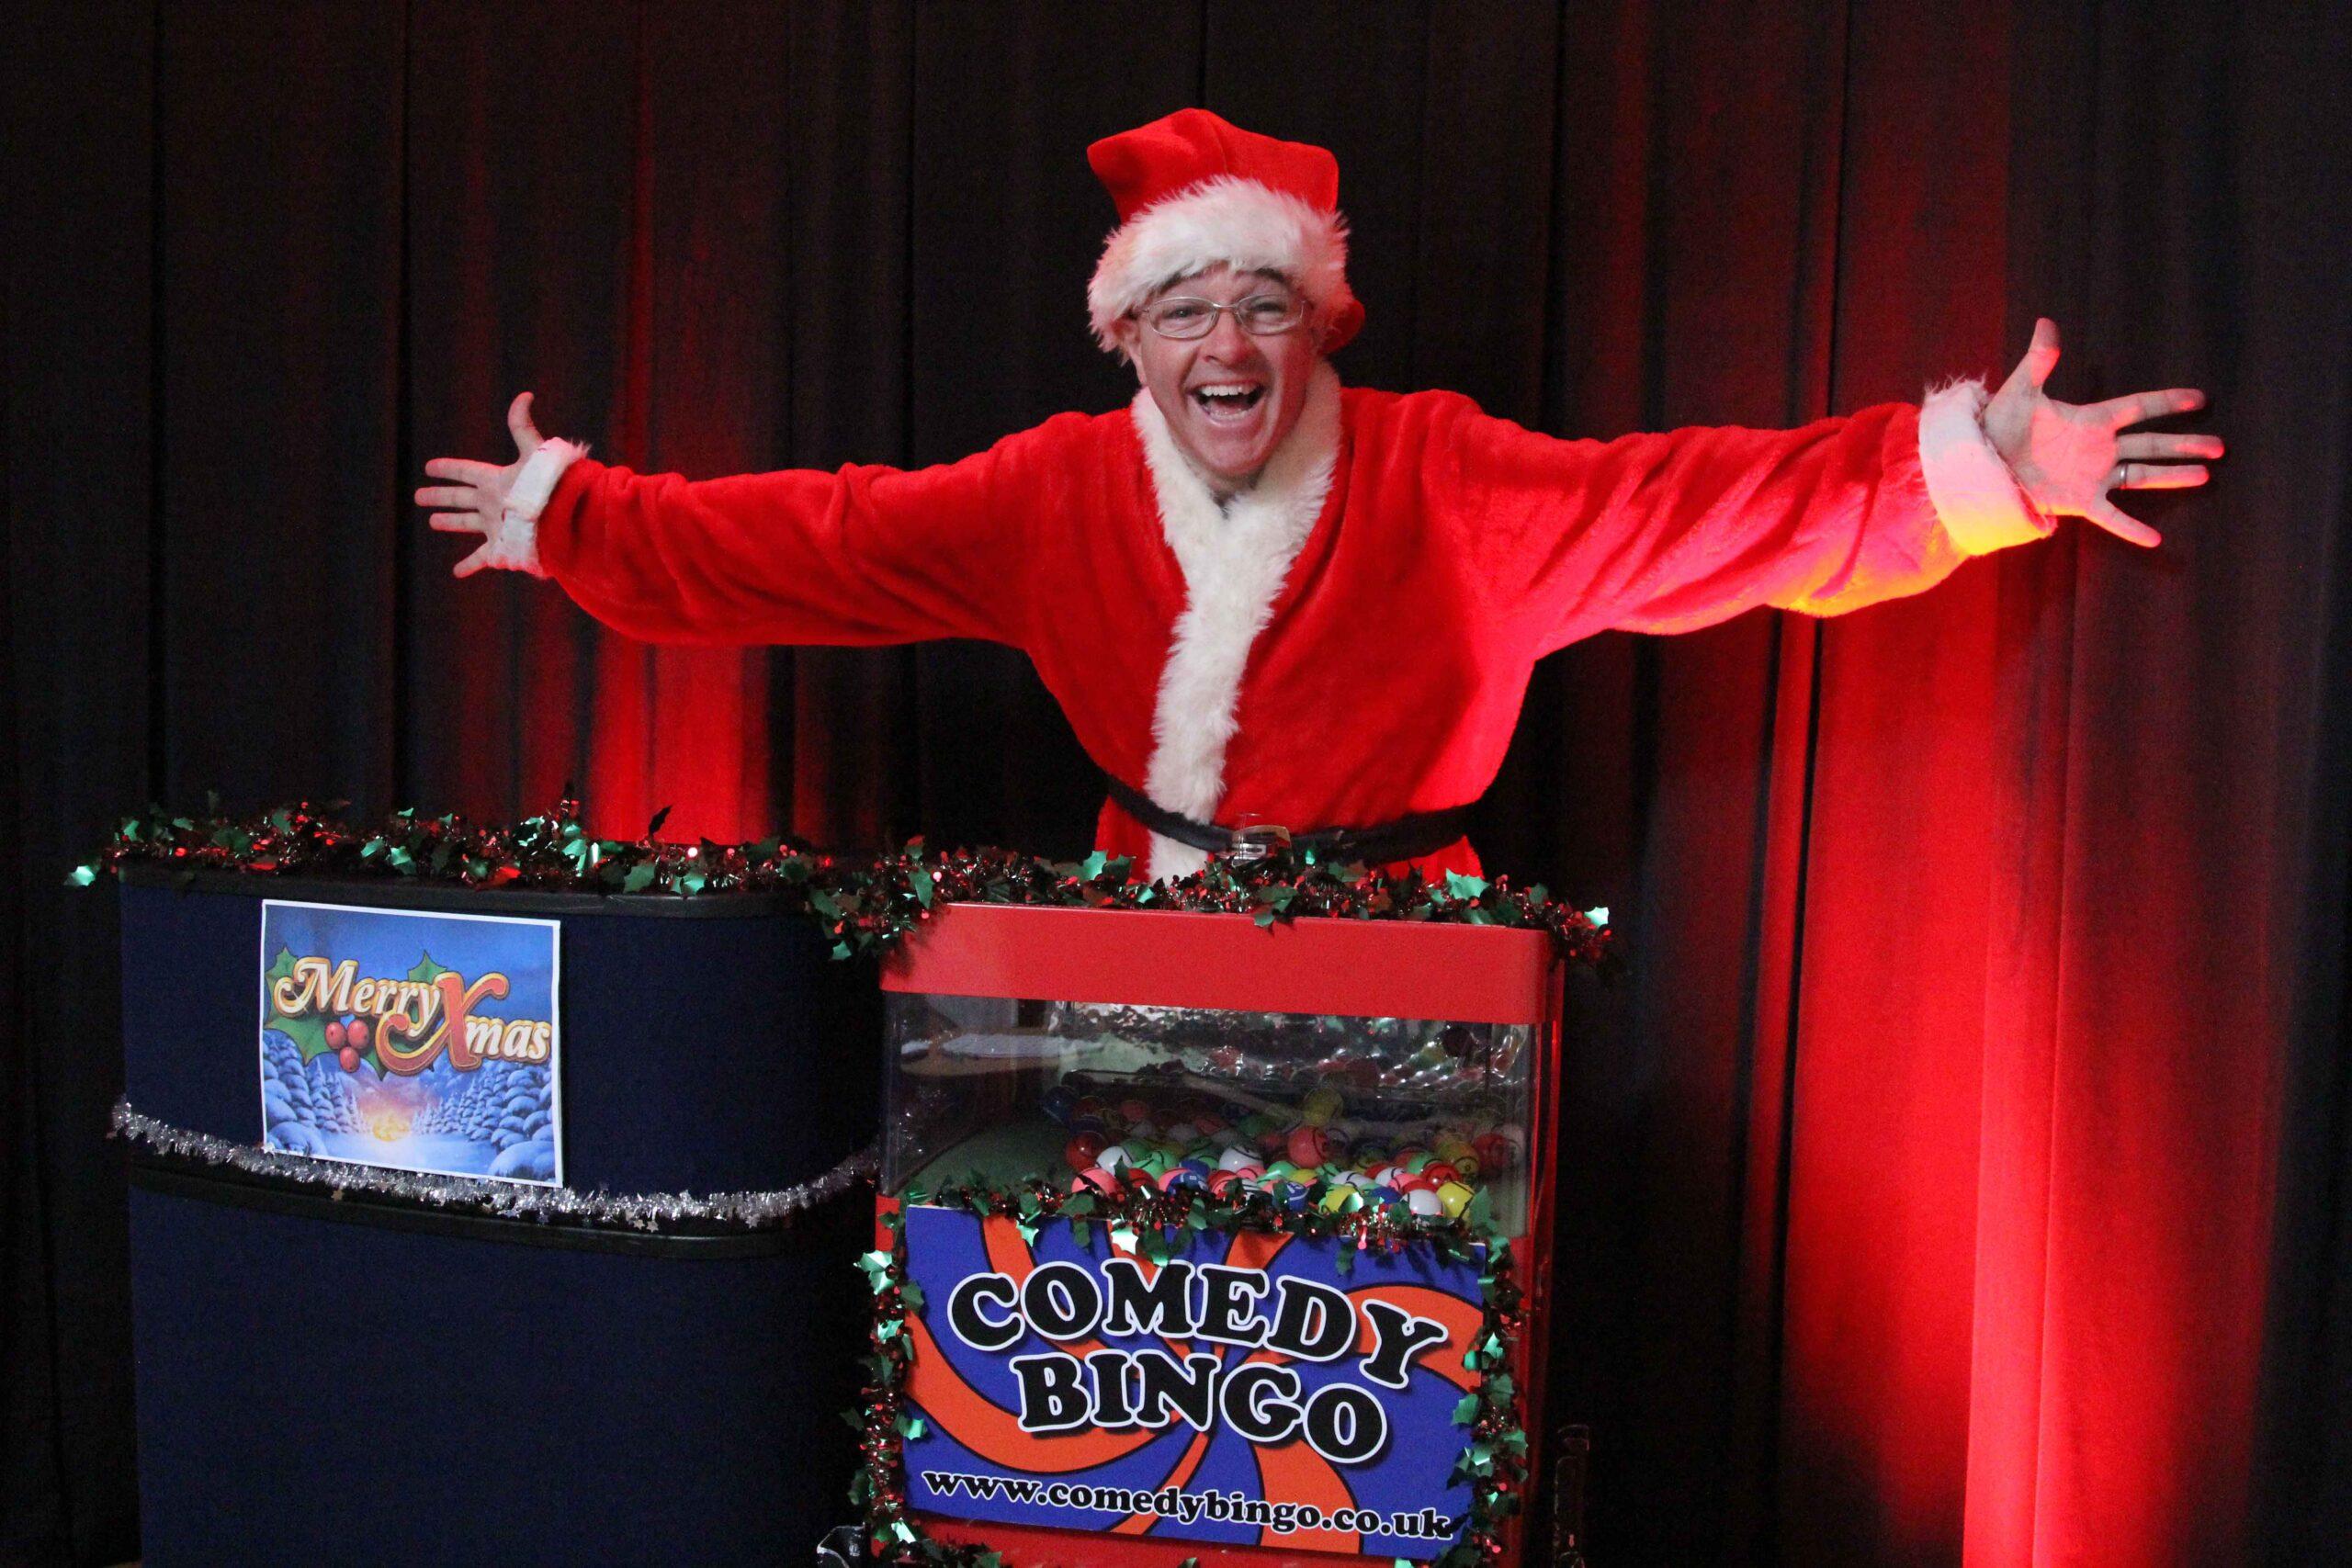 Comedy Bingo host and owner Brendan Riley